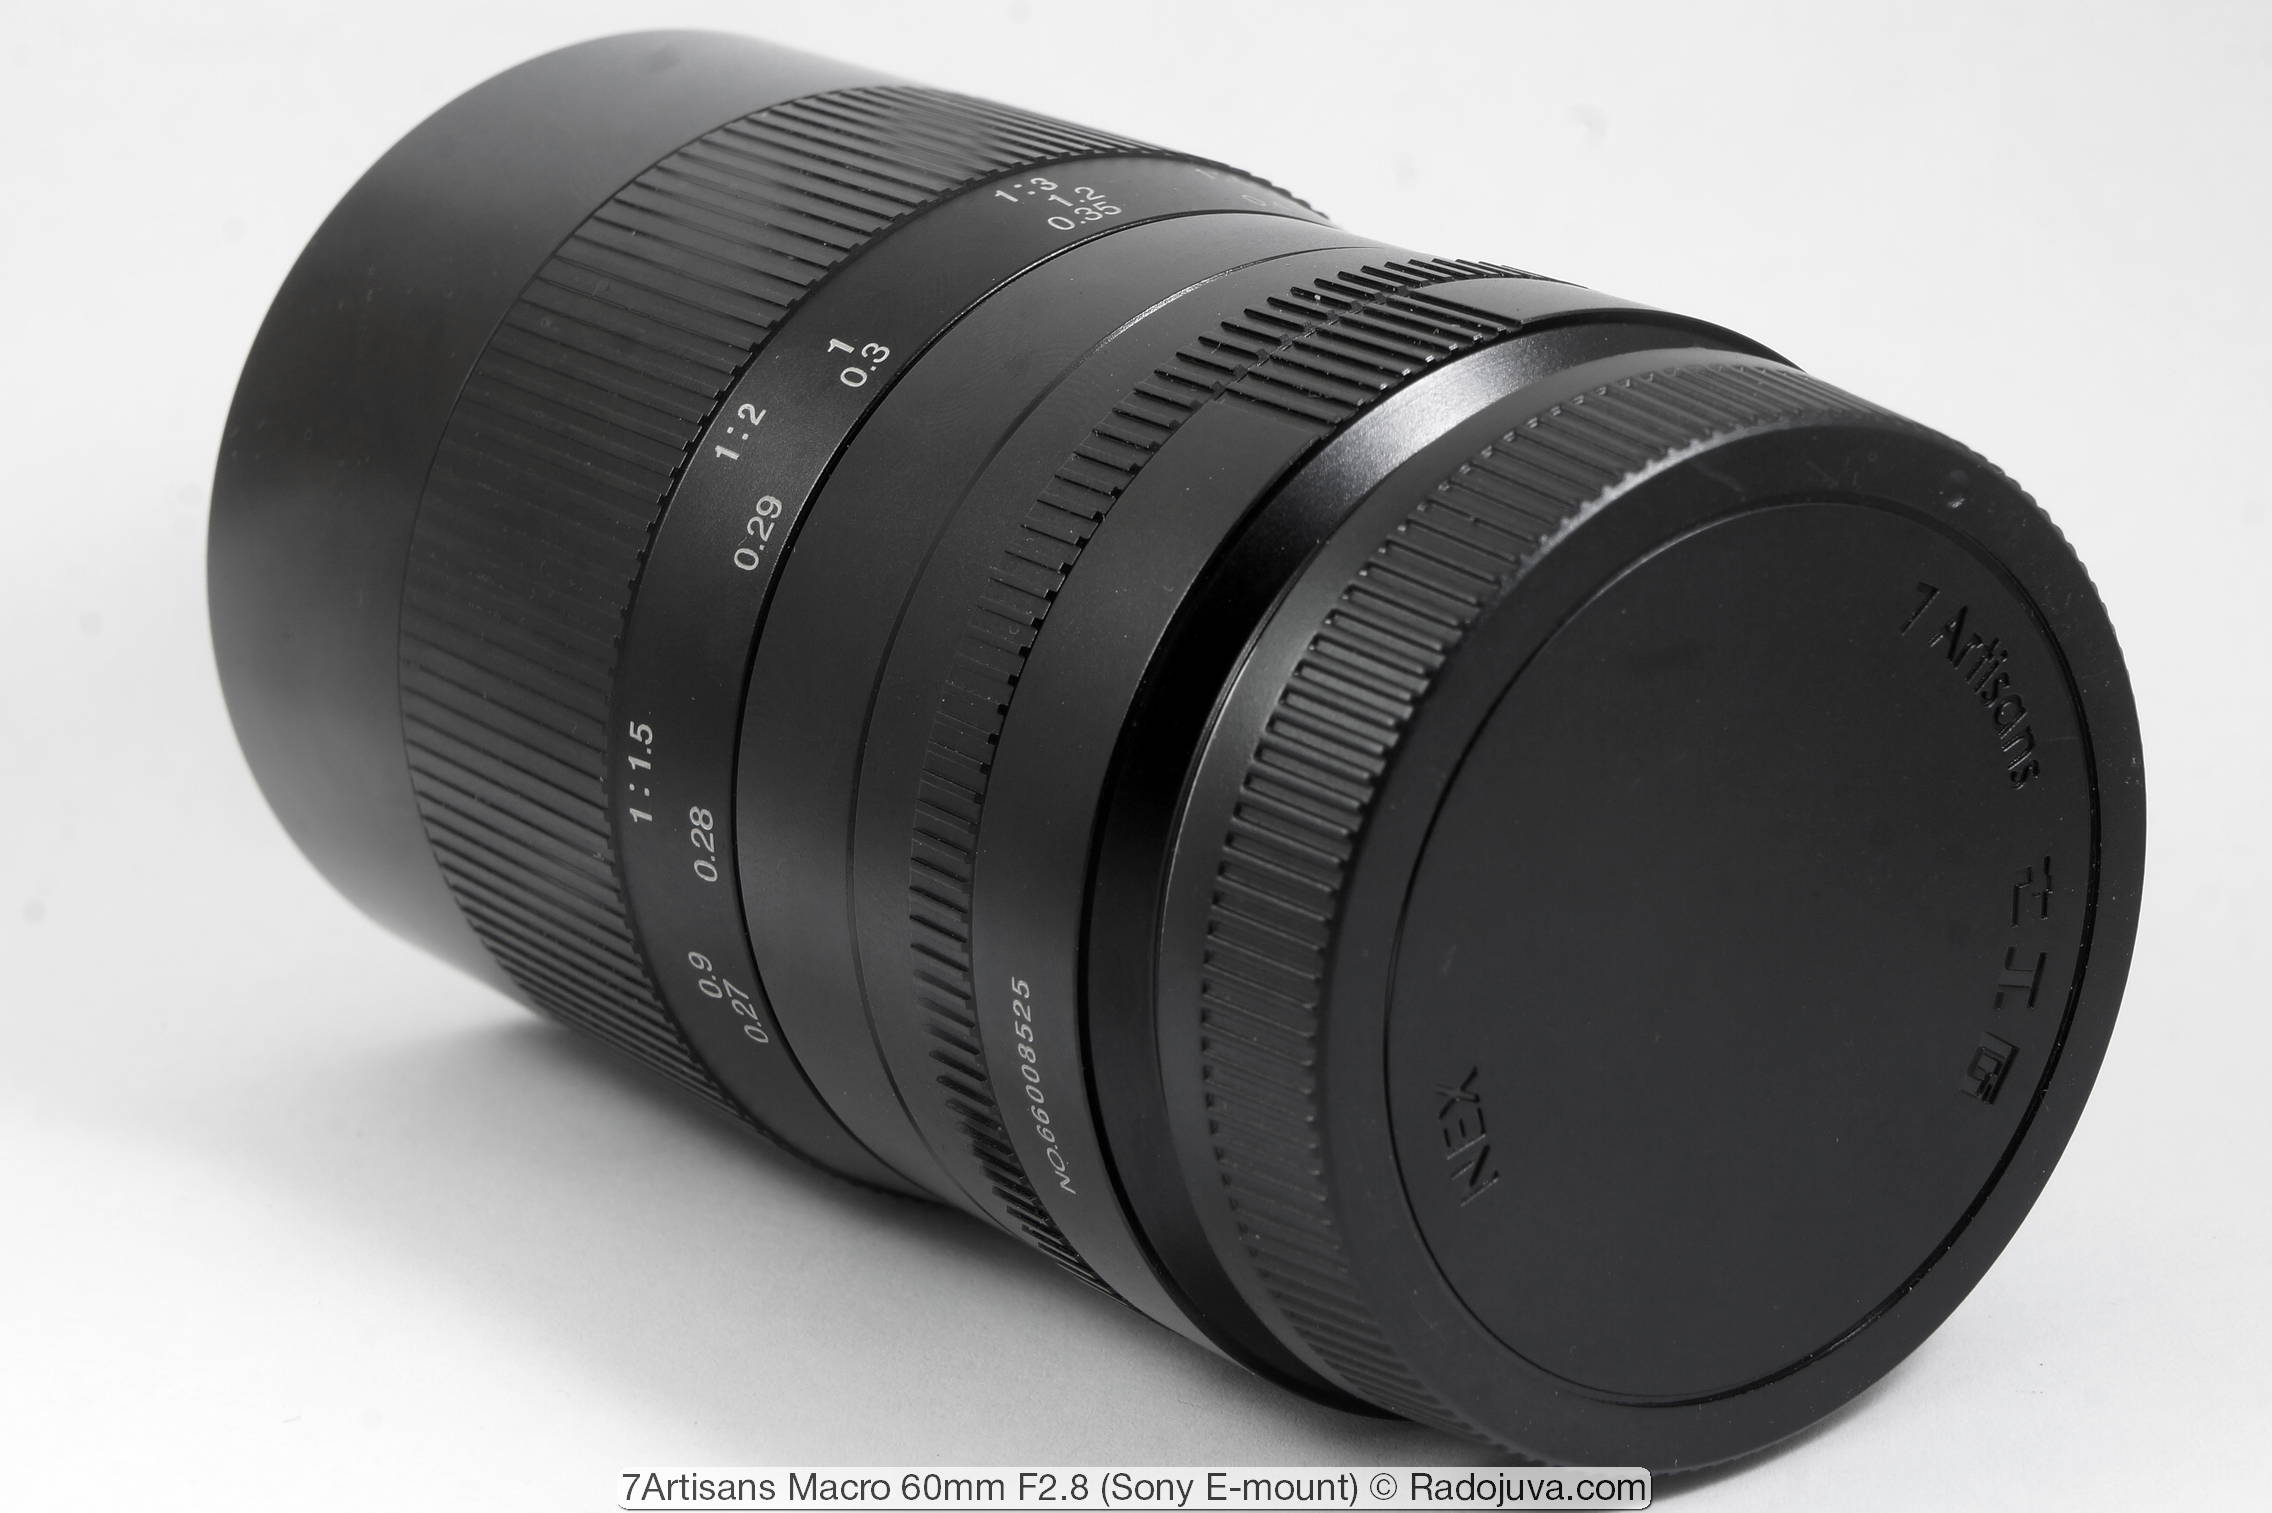 7Artisans Macro 60mm F2.8